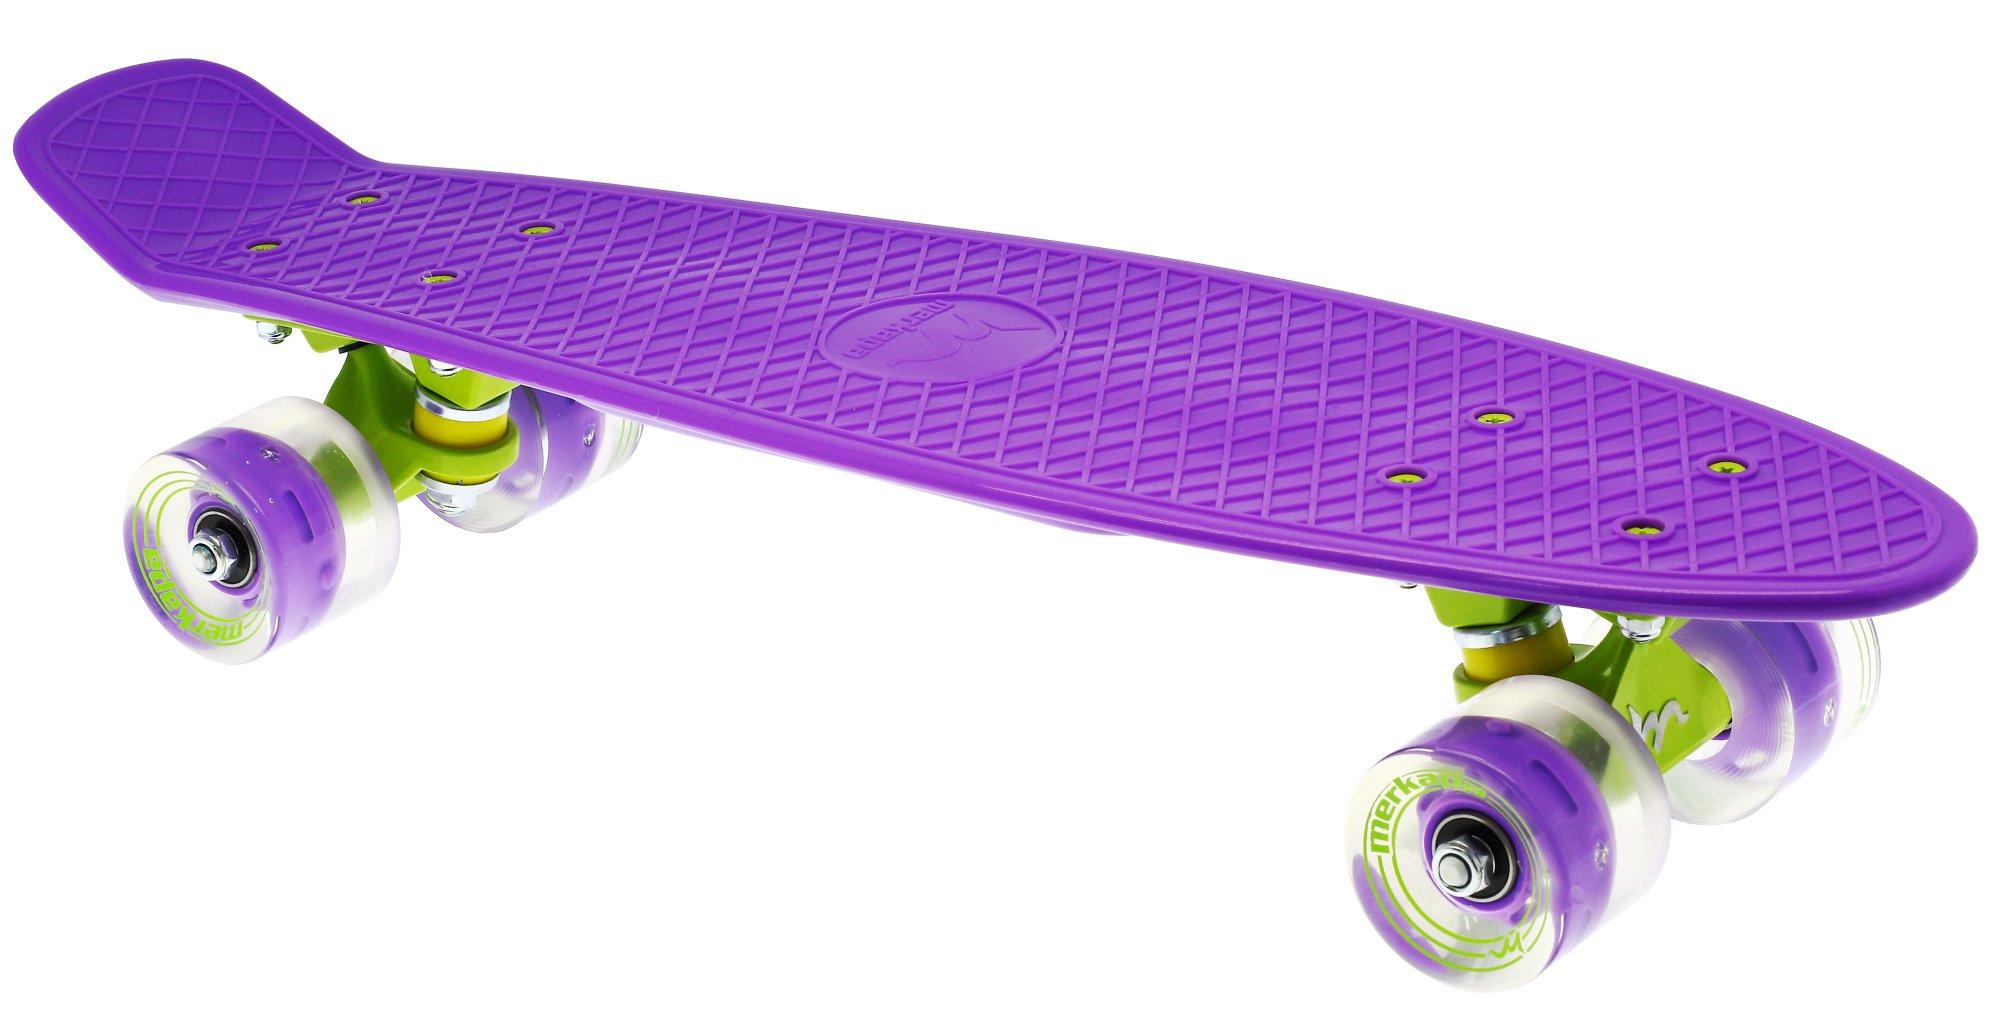 Merkapa 22'' Complete Skateboard with Colorful LED Light Up Wheels for Beginners (Purple)